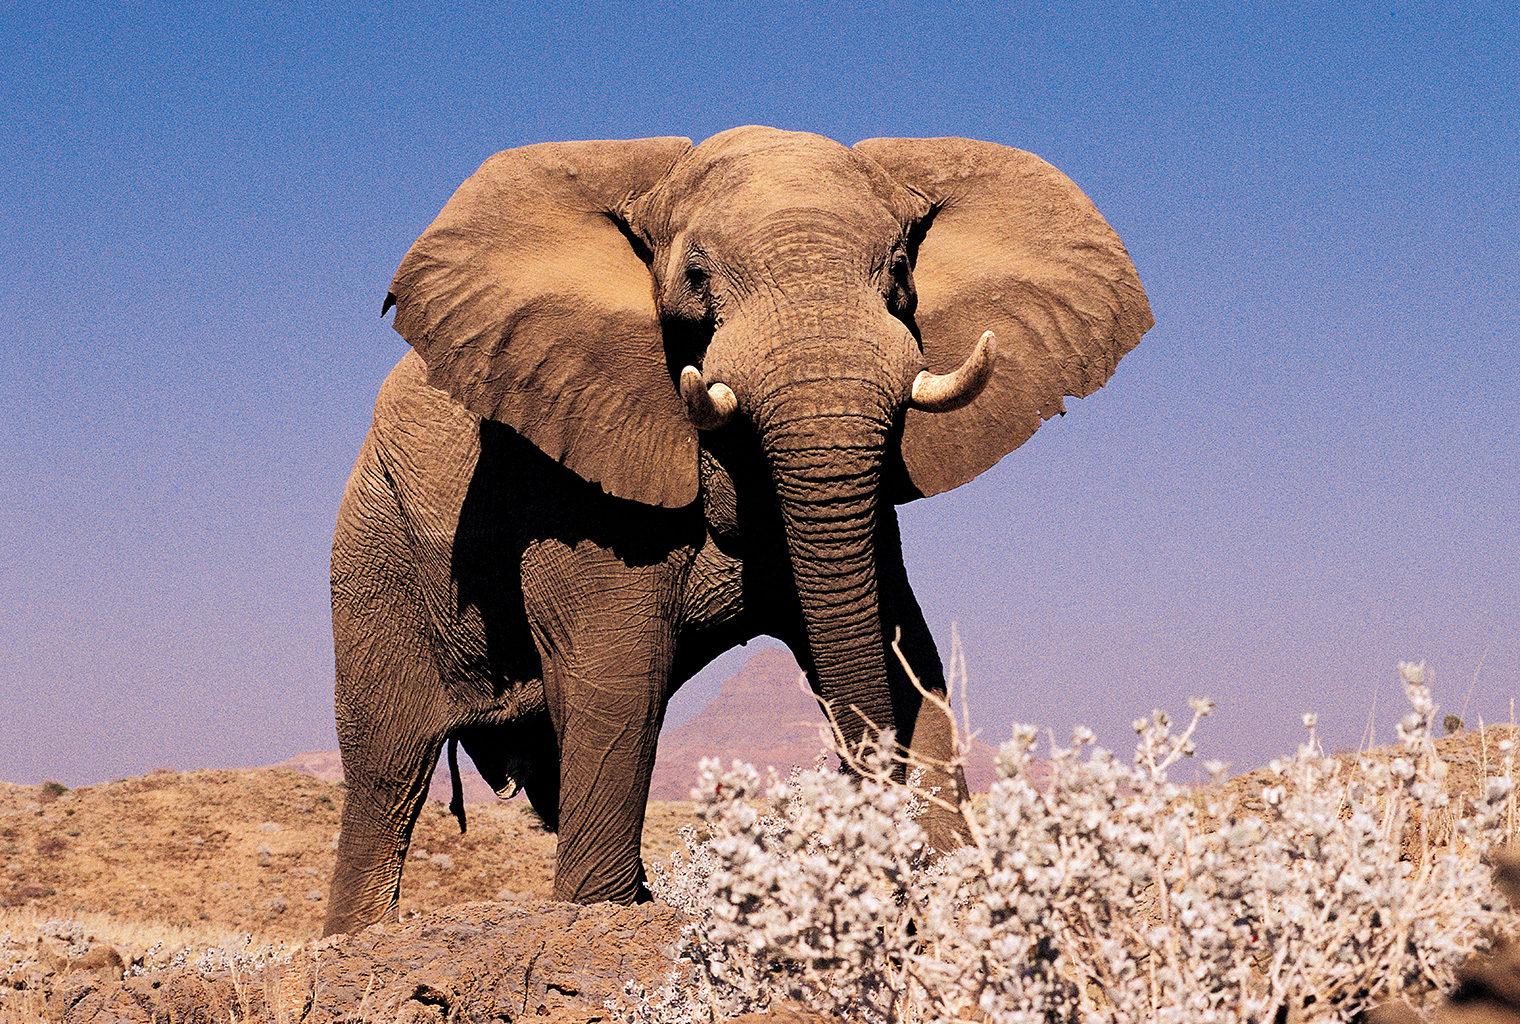 Mowani Mountain Camp, Namibia, Elephant